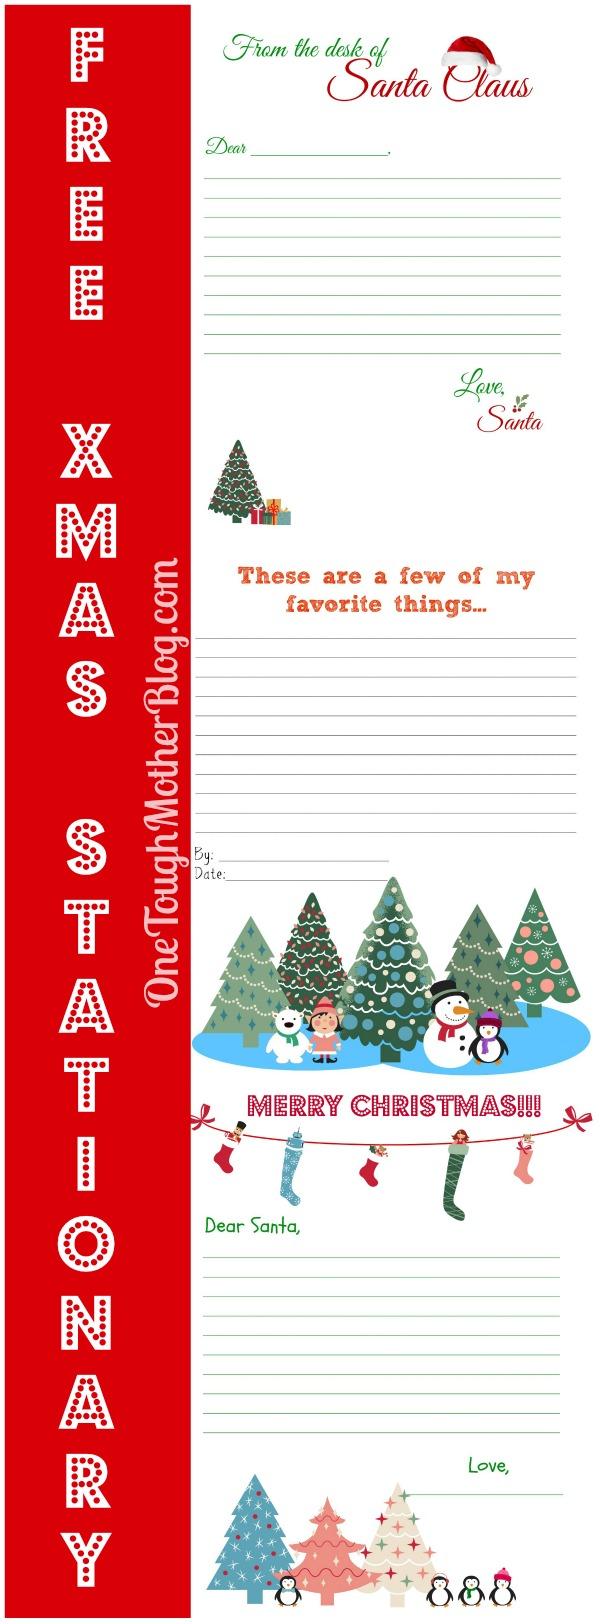 Free Christmas Stationary sweetteaandsavinggraceblog.com